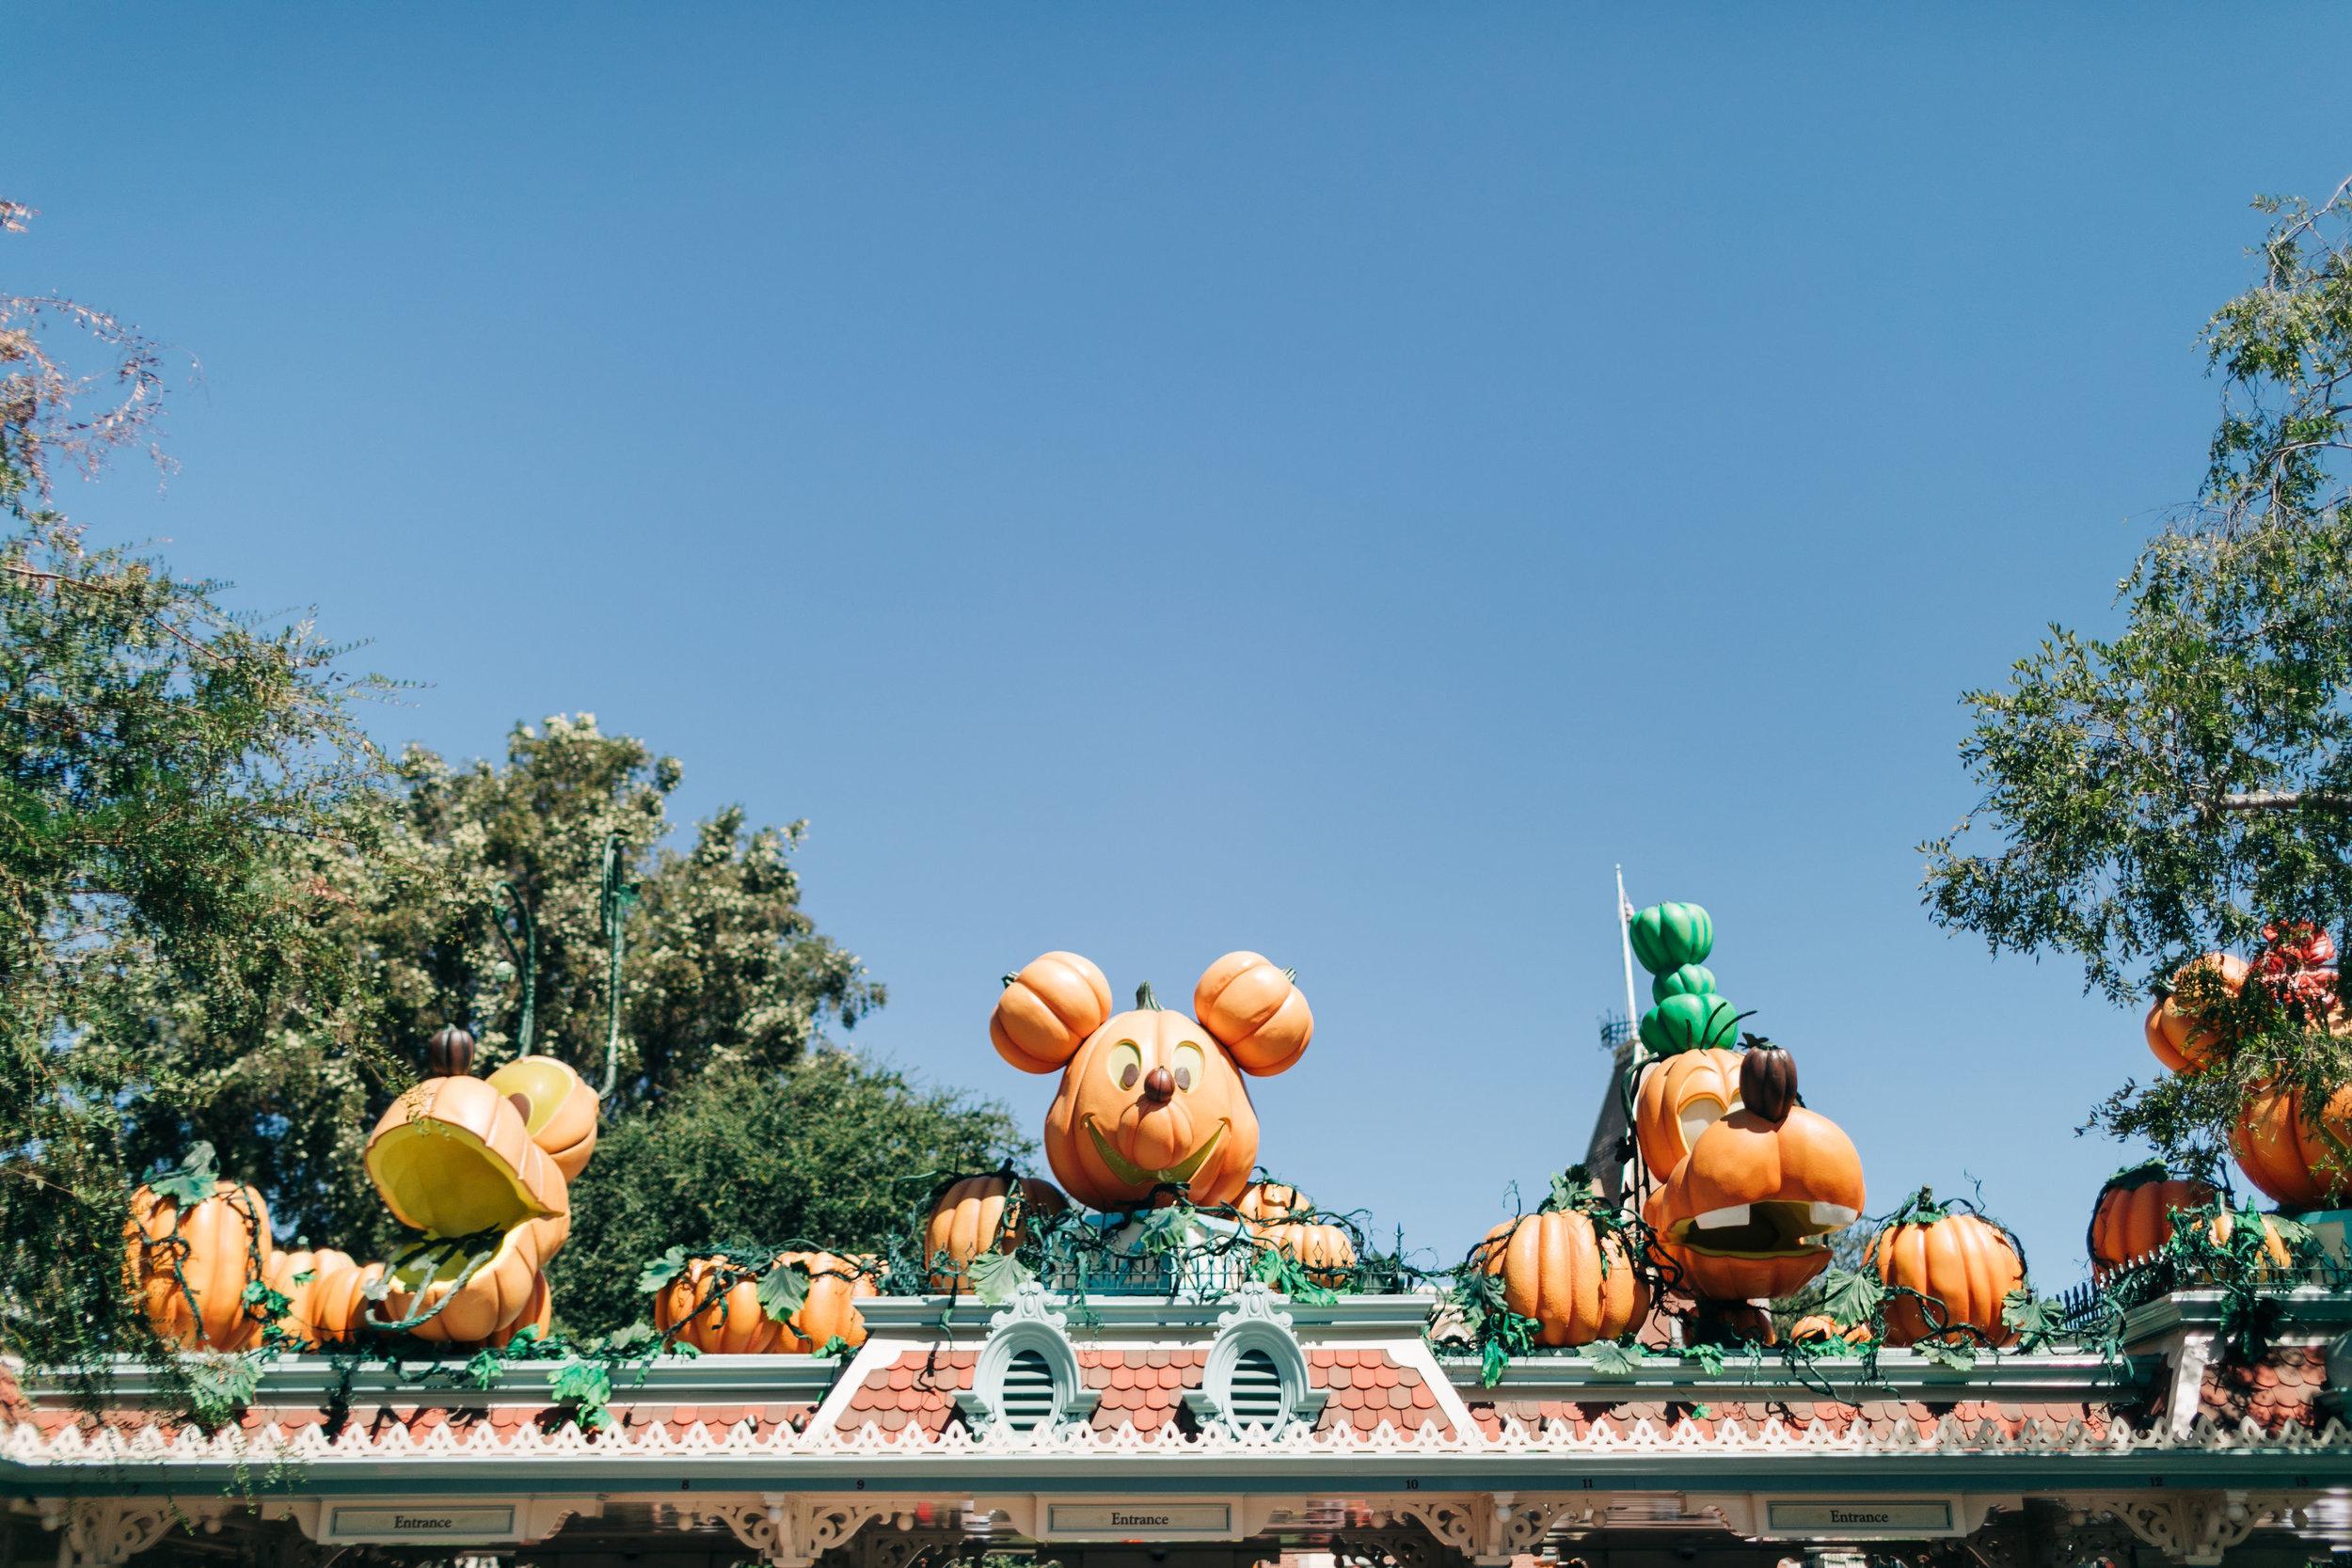 Disneyland_Halloween-LilyRoPhotography-1.jpg